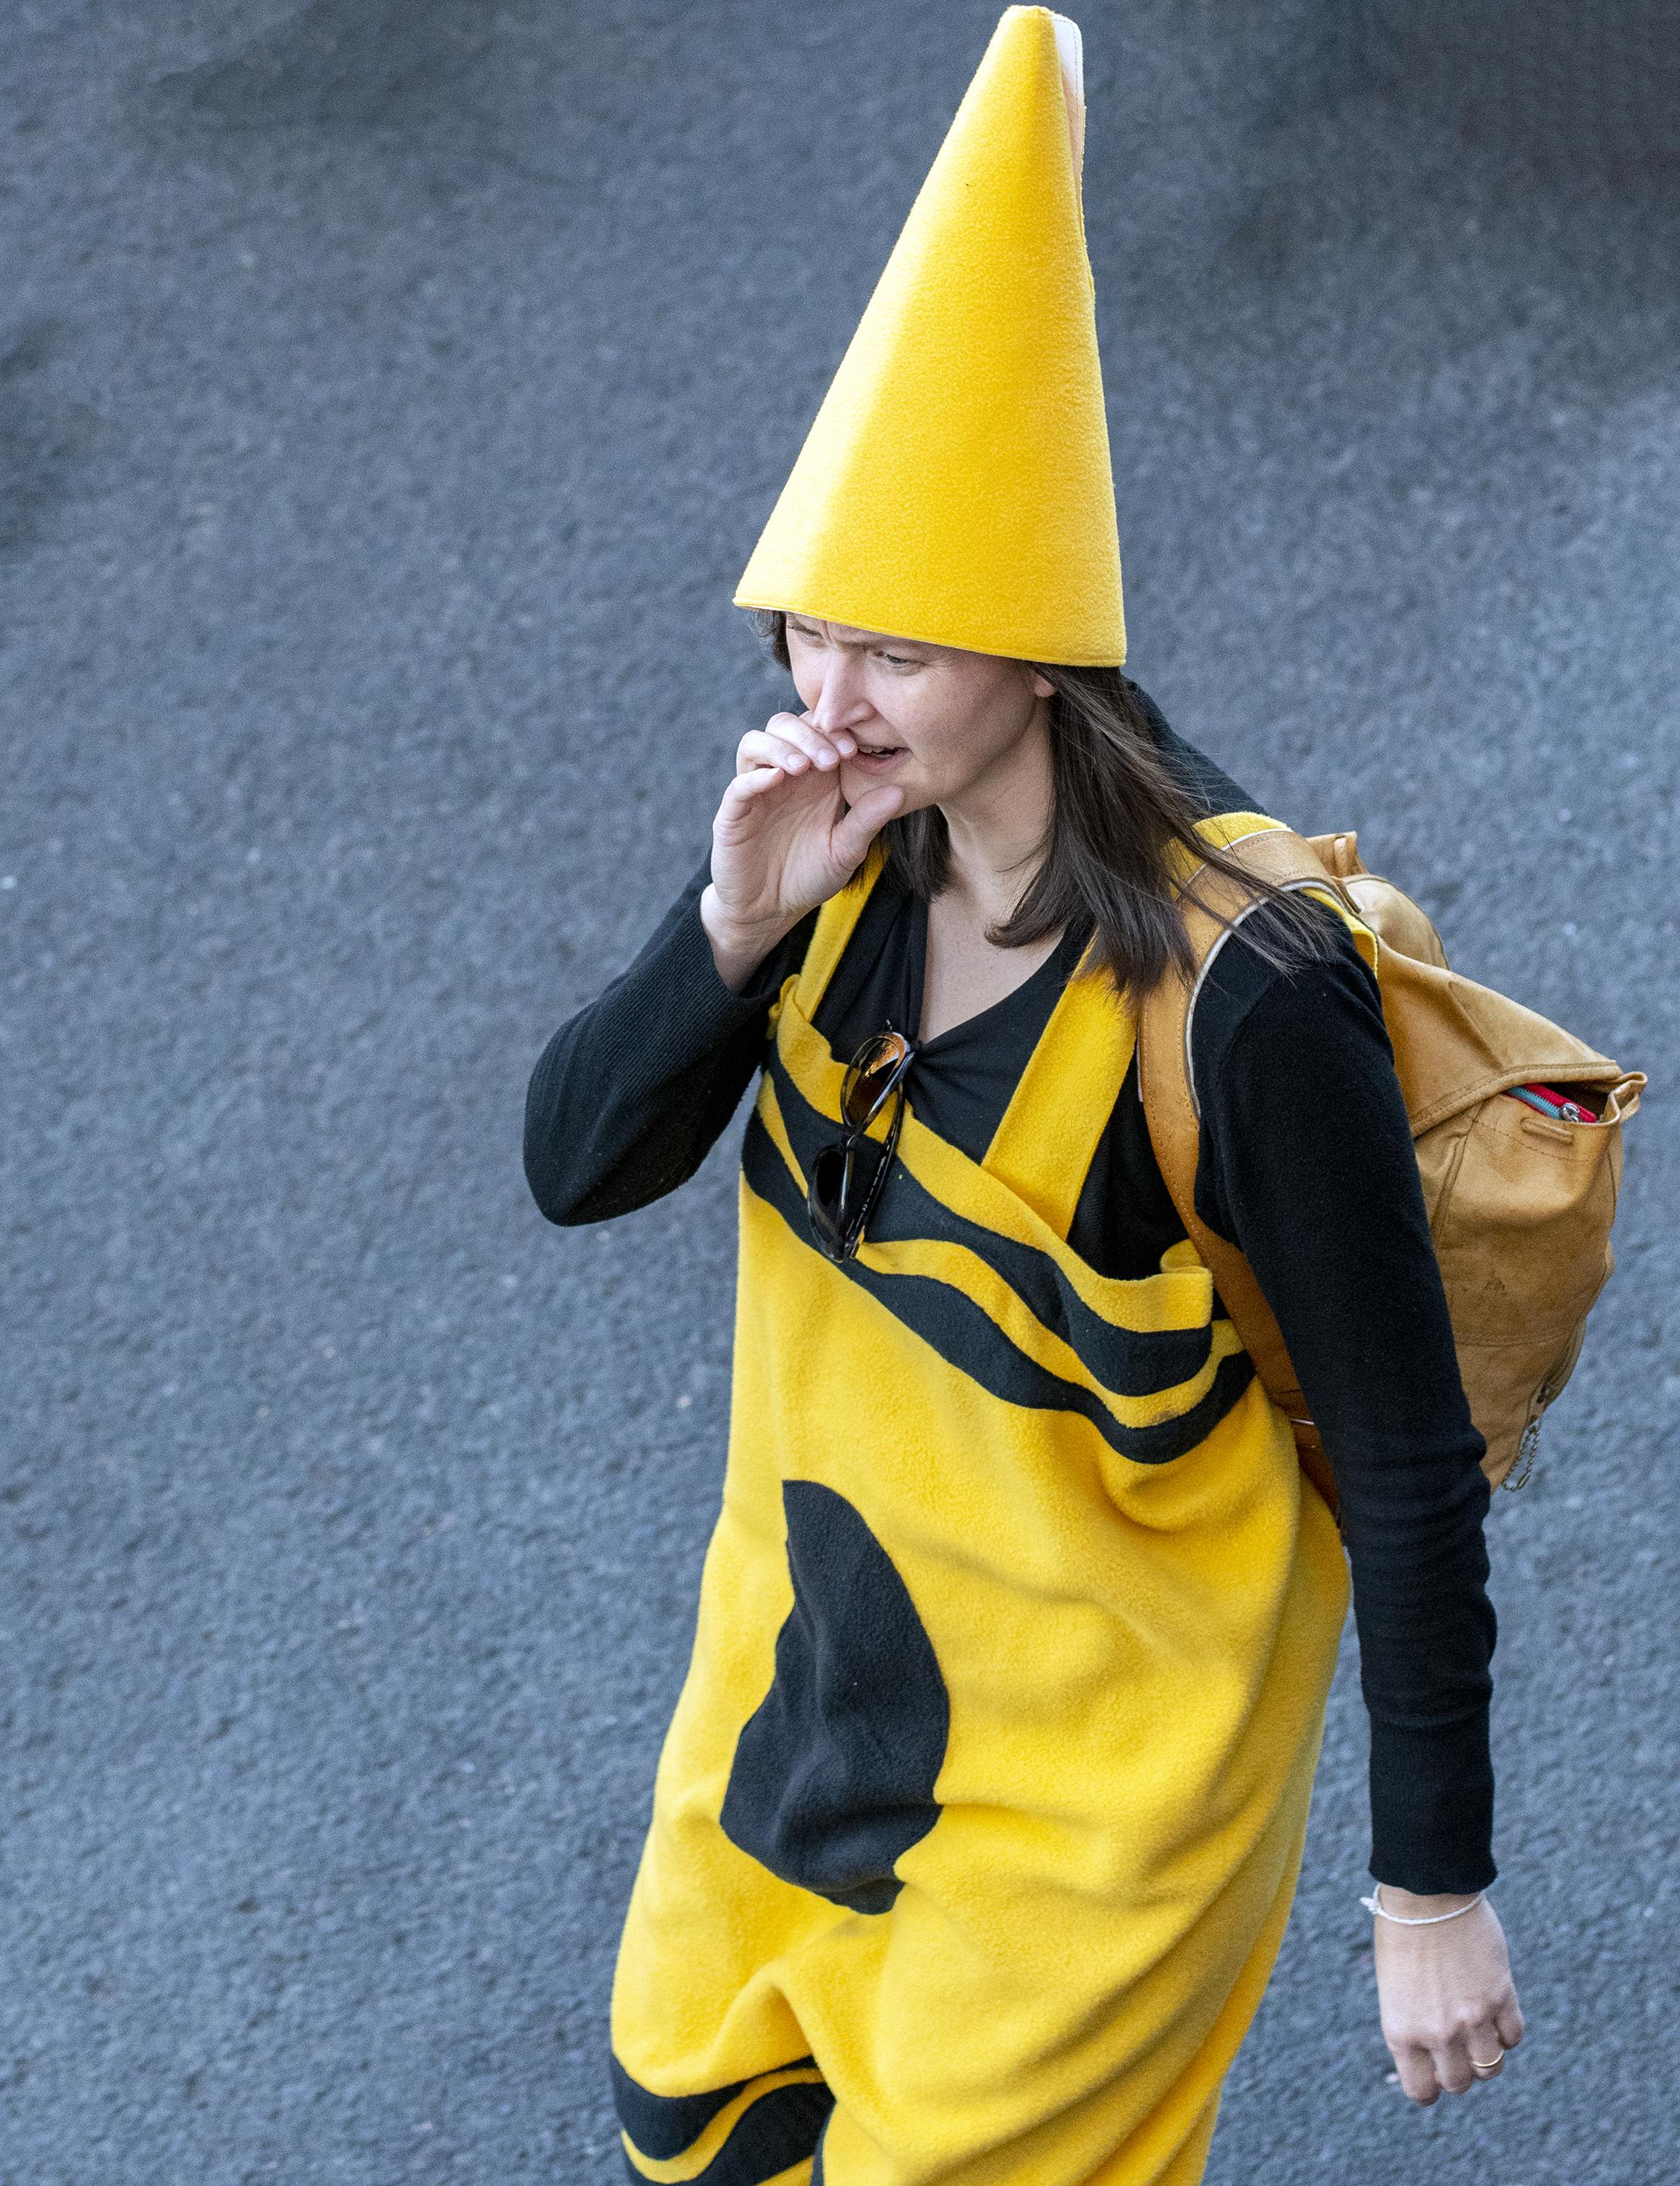 amy kneeland preskenis yellow crayon crayola halloween costume parade ashland